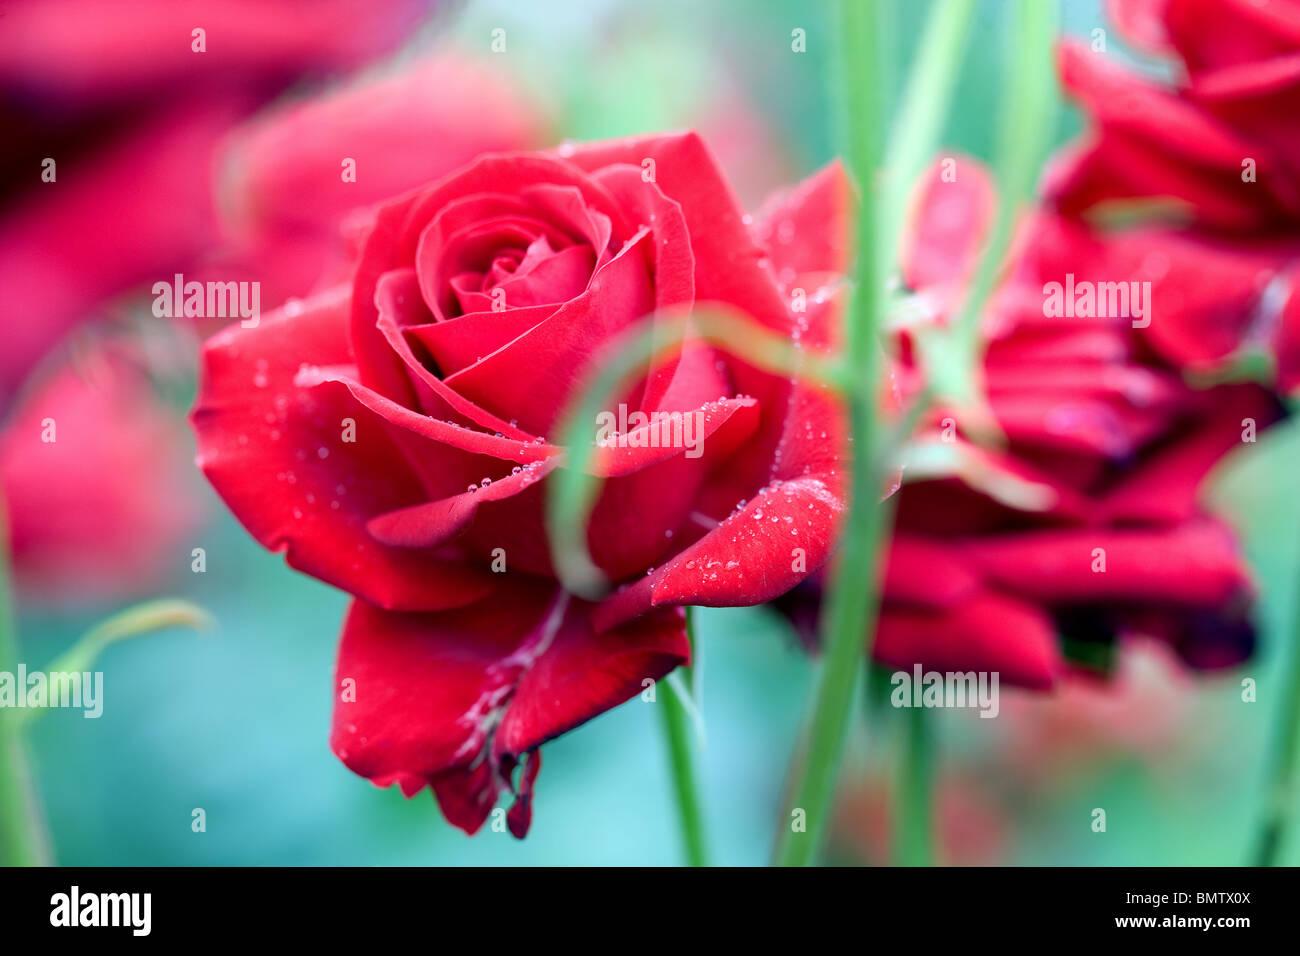 Roses, flowers, hobbies, gardening, green, nature - Stock Image